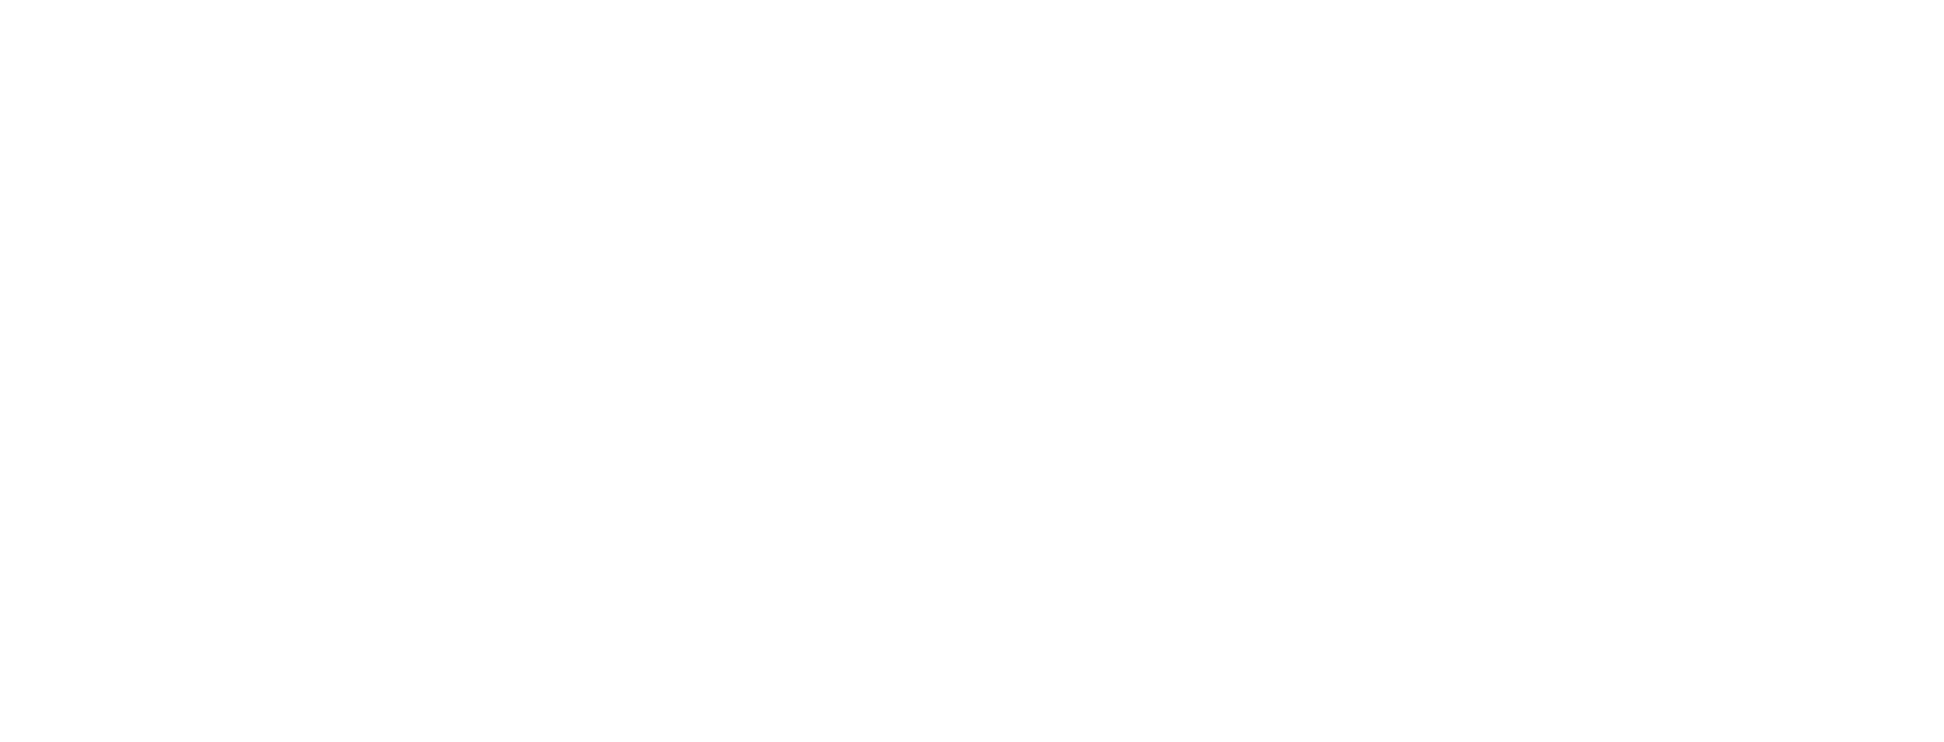 Freddy's Primary Script Logo Reserve